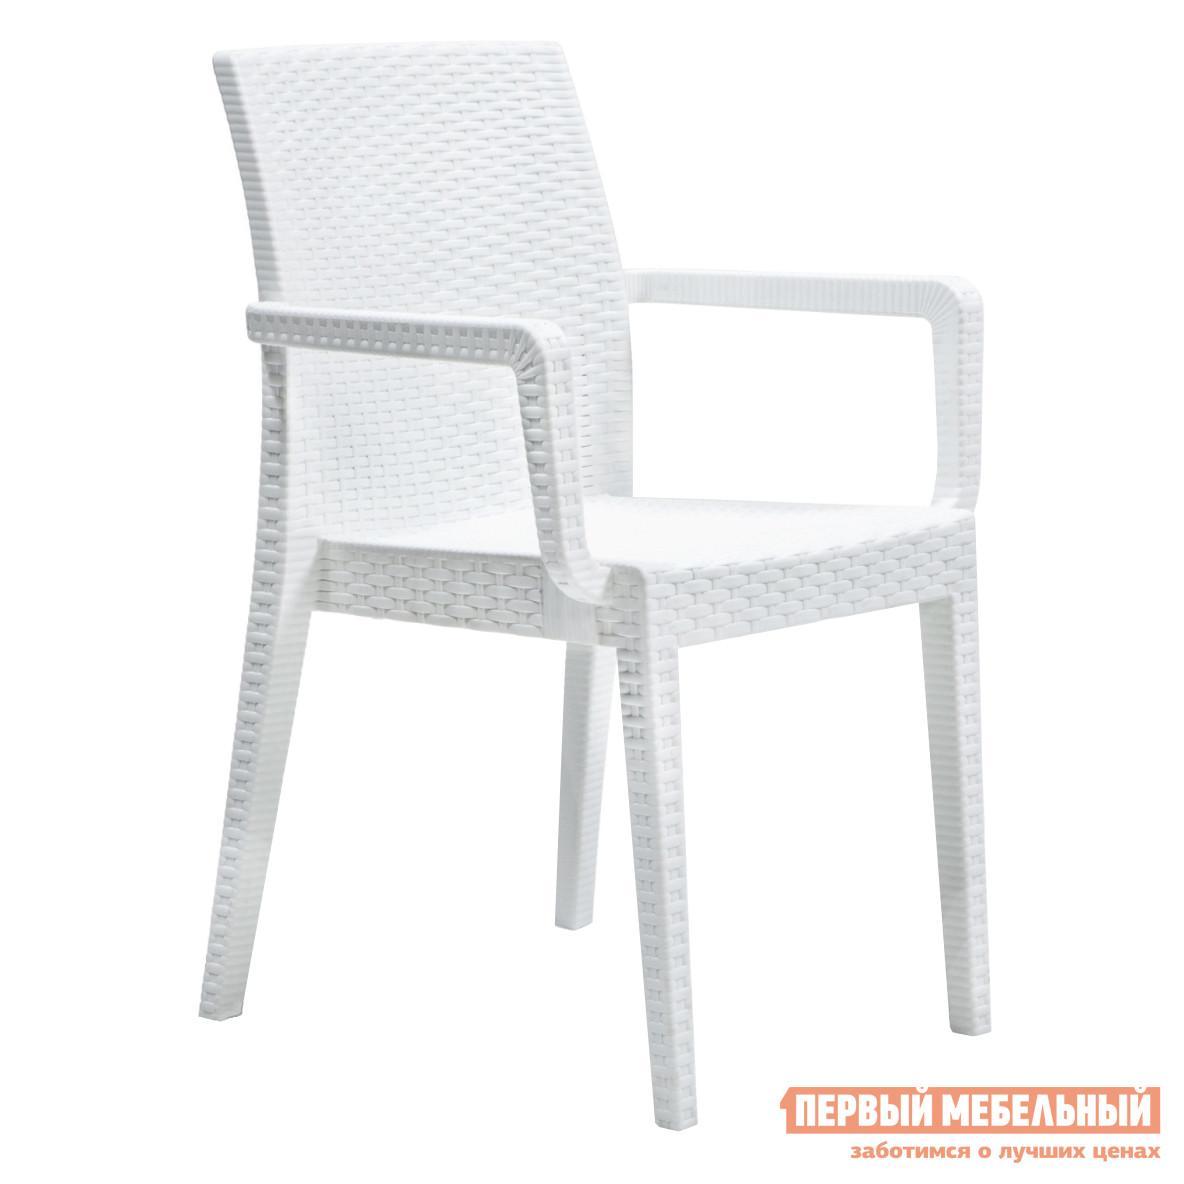 Плетеное кресло Рихаус Кресло пластиковое Siena DEL/SIE-R/ARM/F/WH